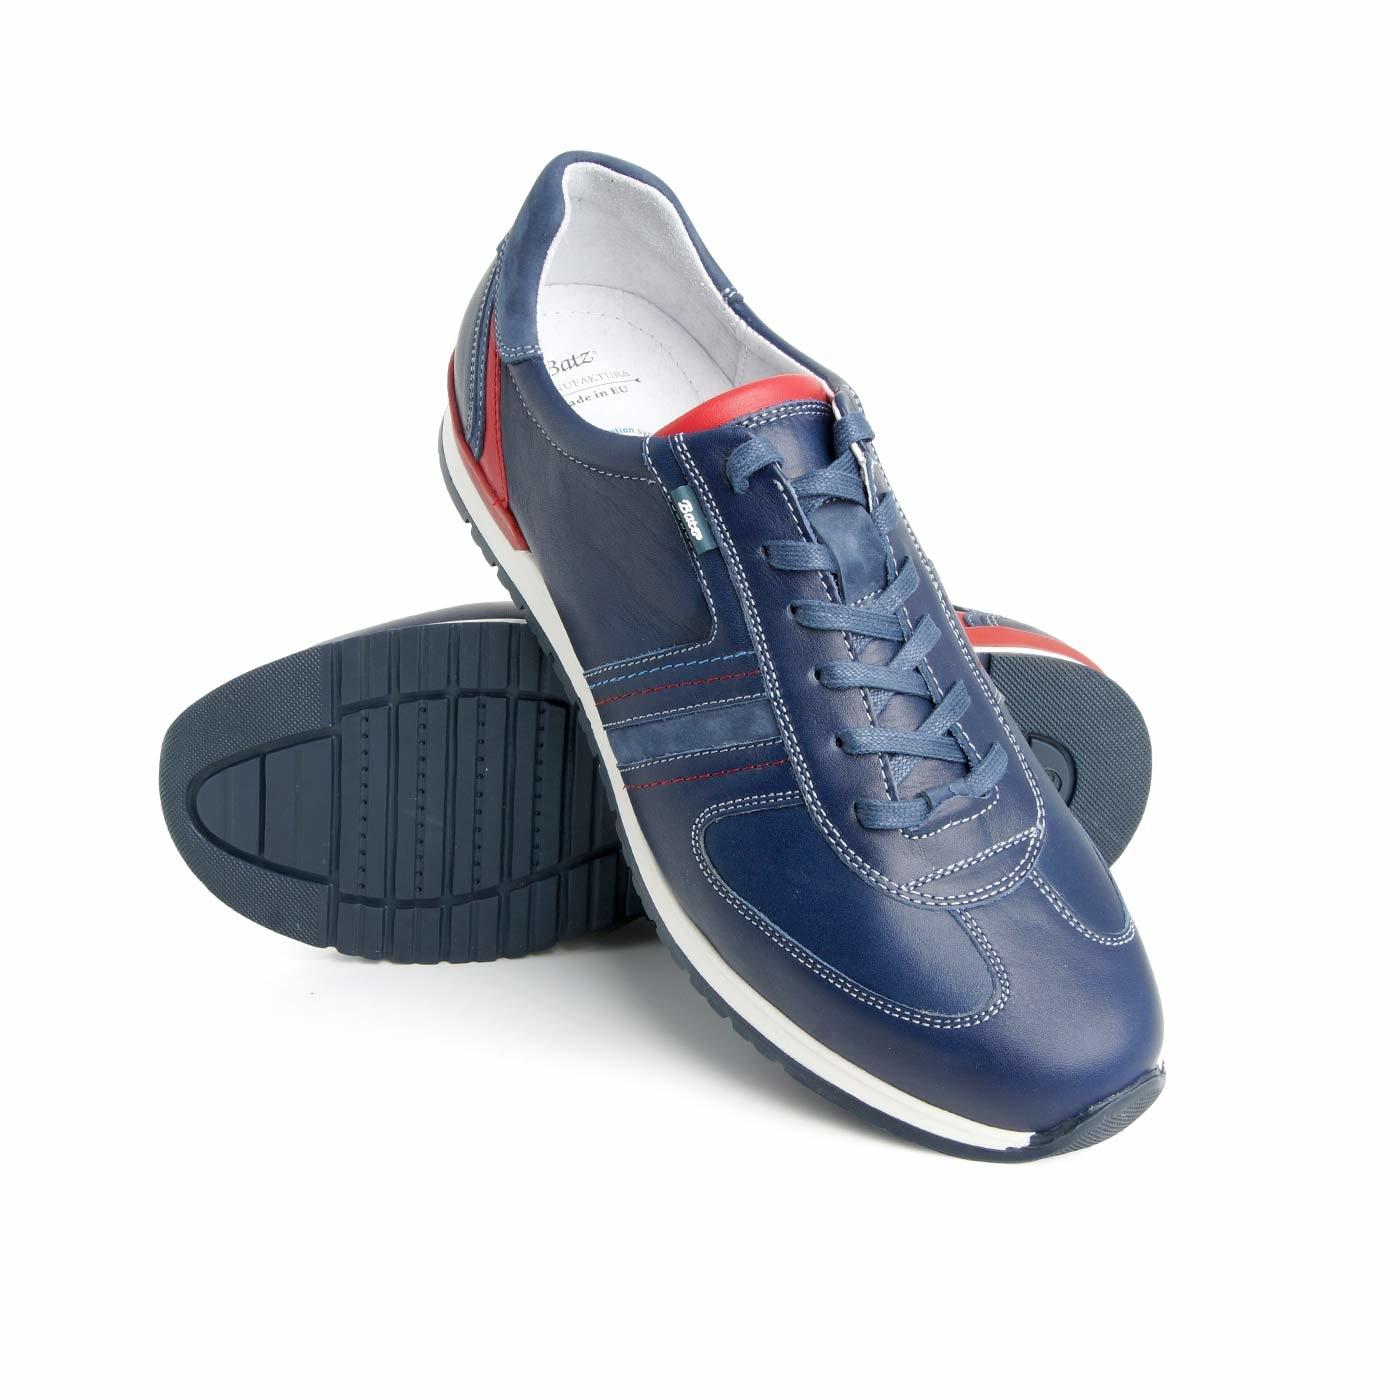 Sky utcai cipő